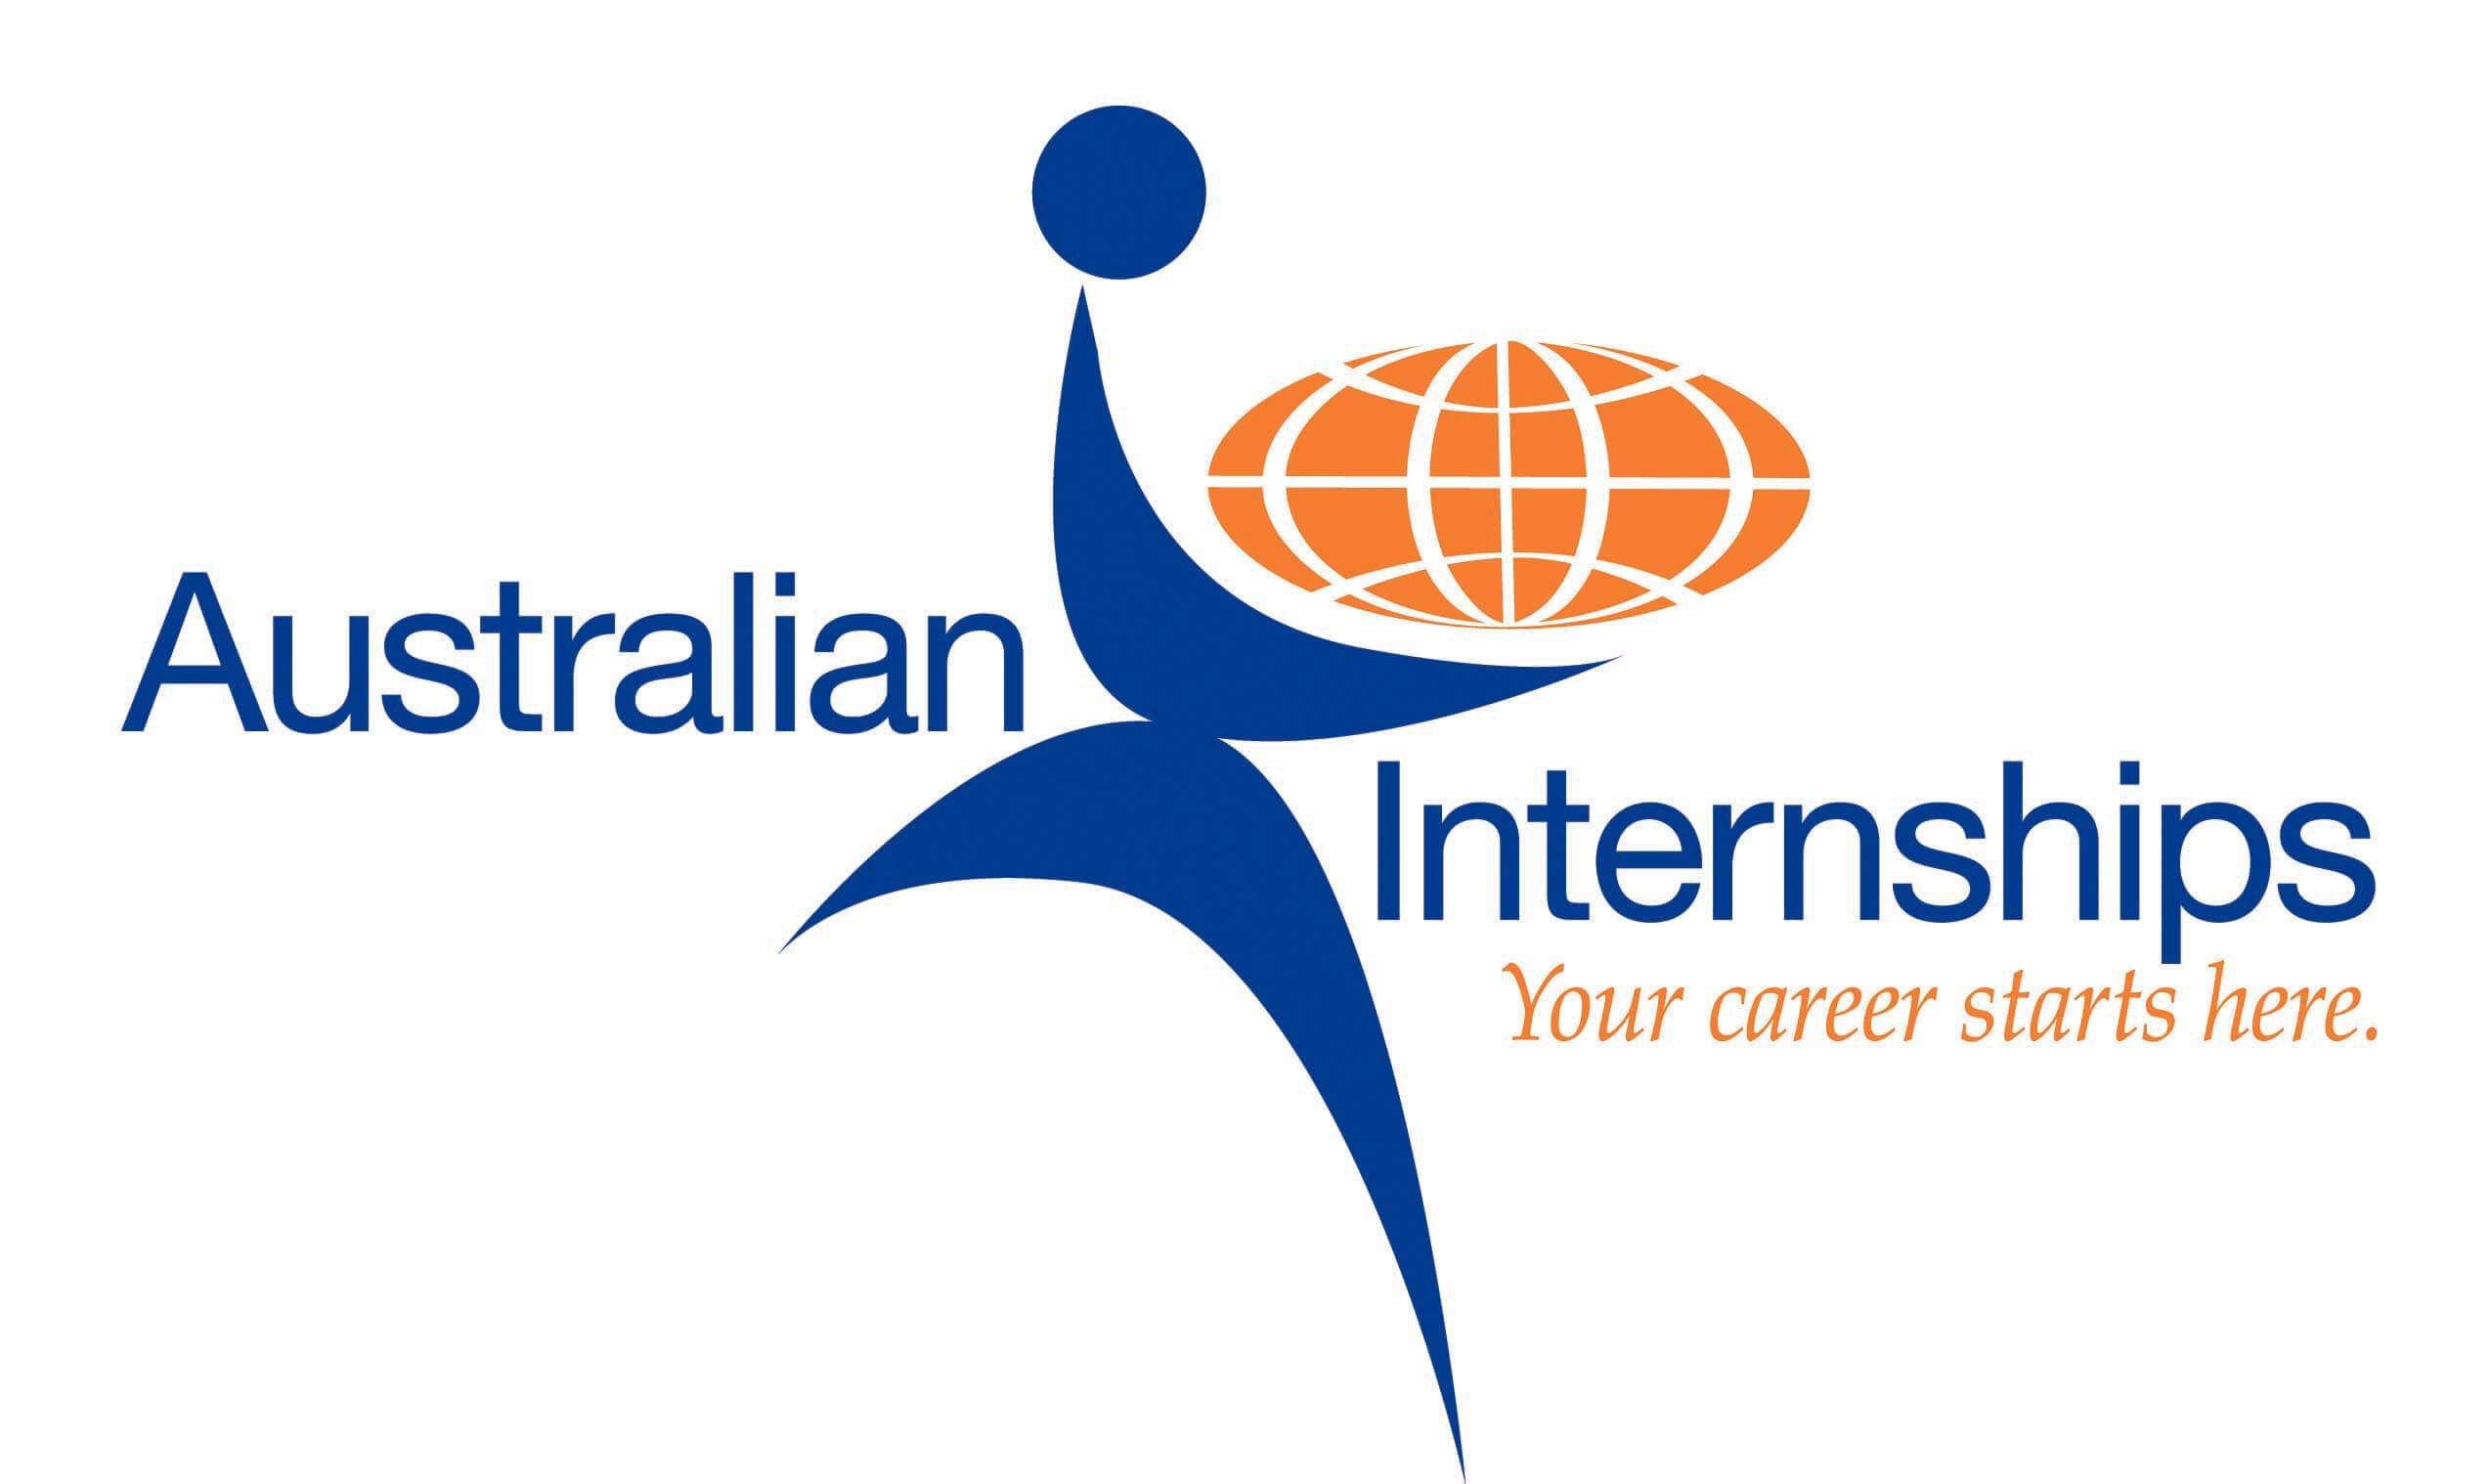 Australian Internships Logo